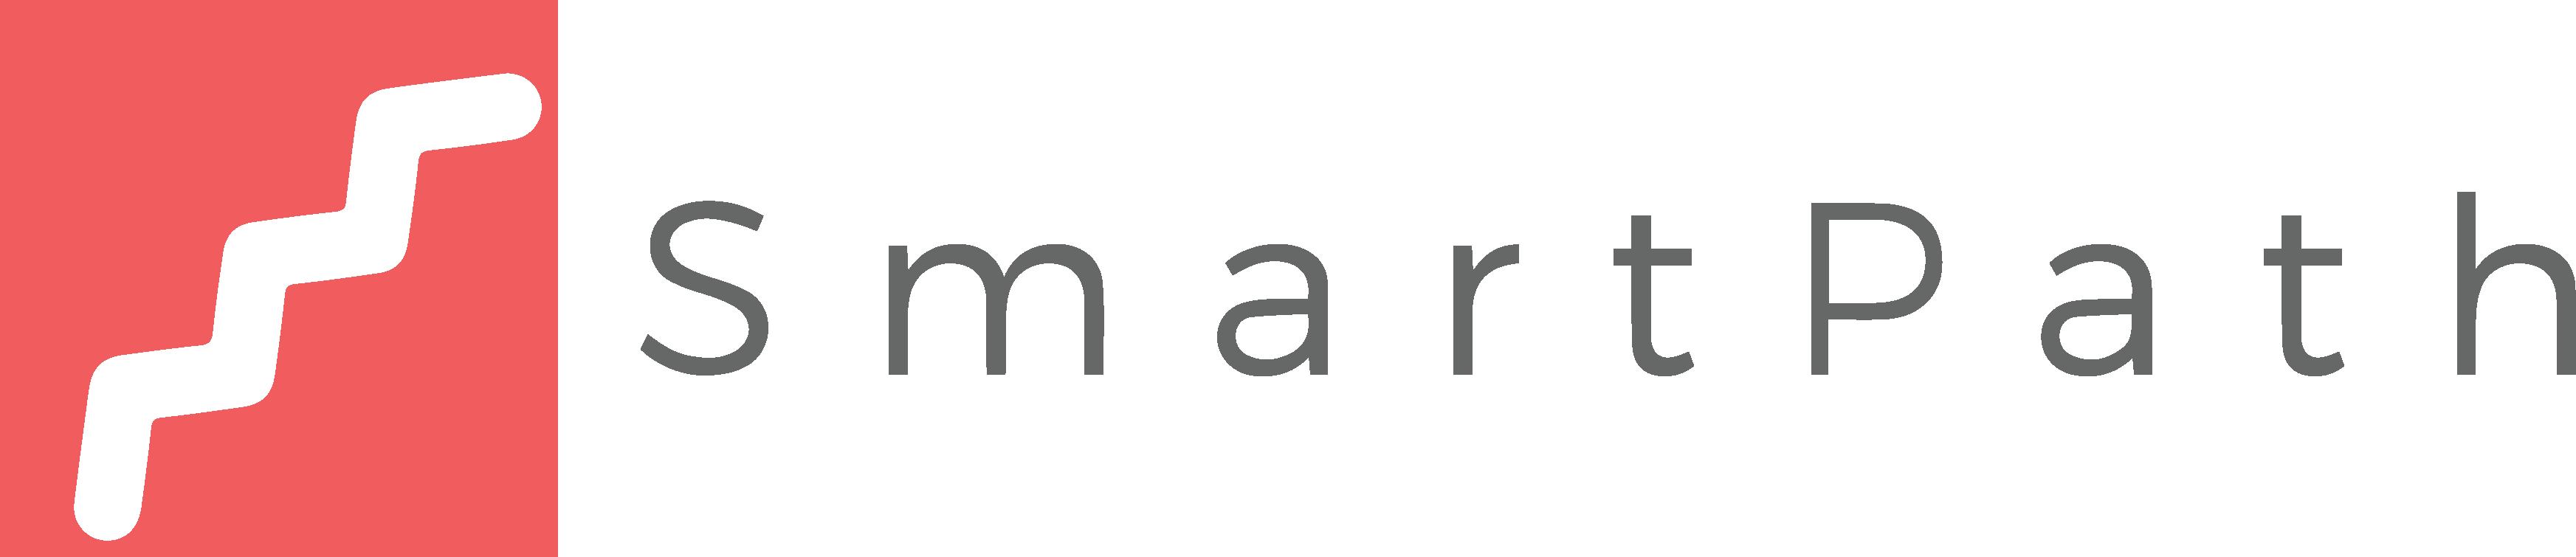 SmartPath.co